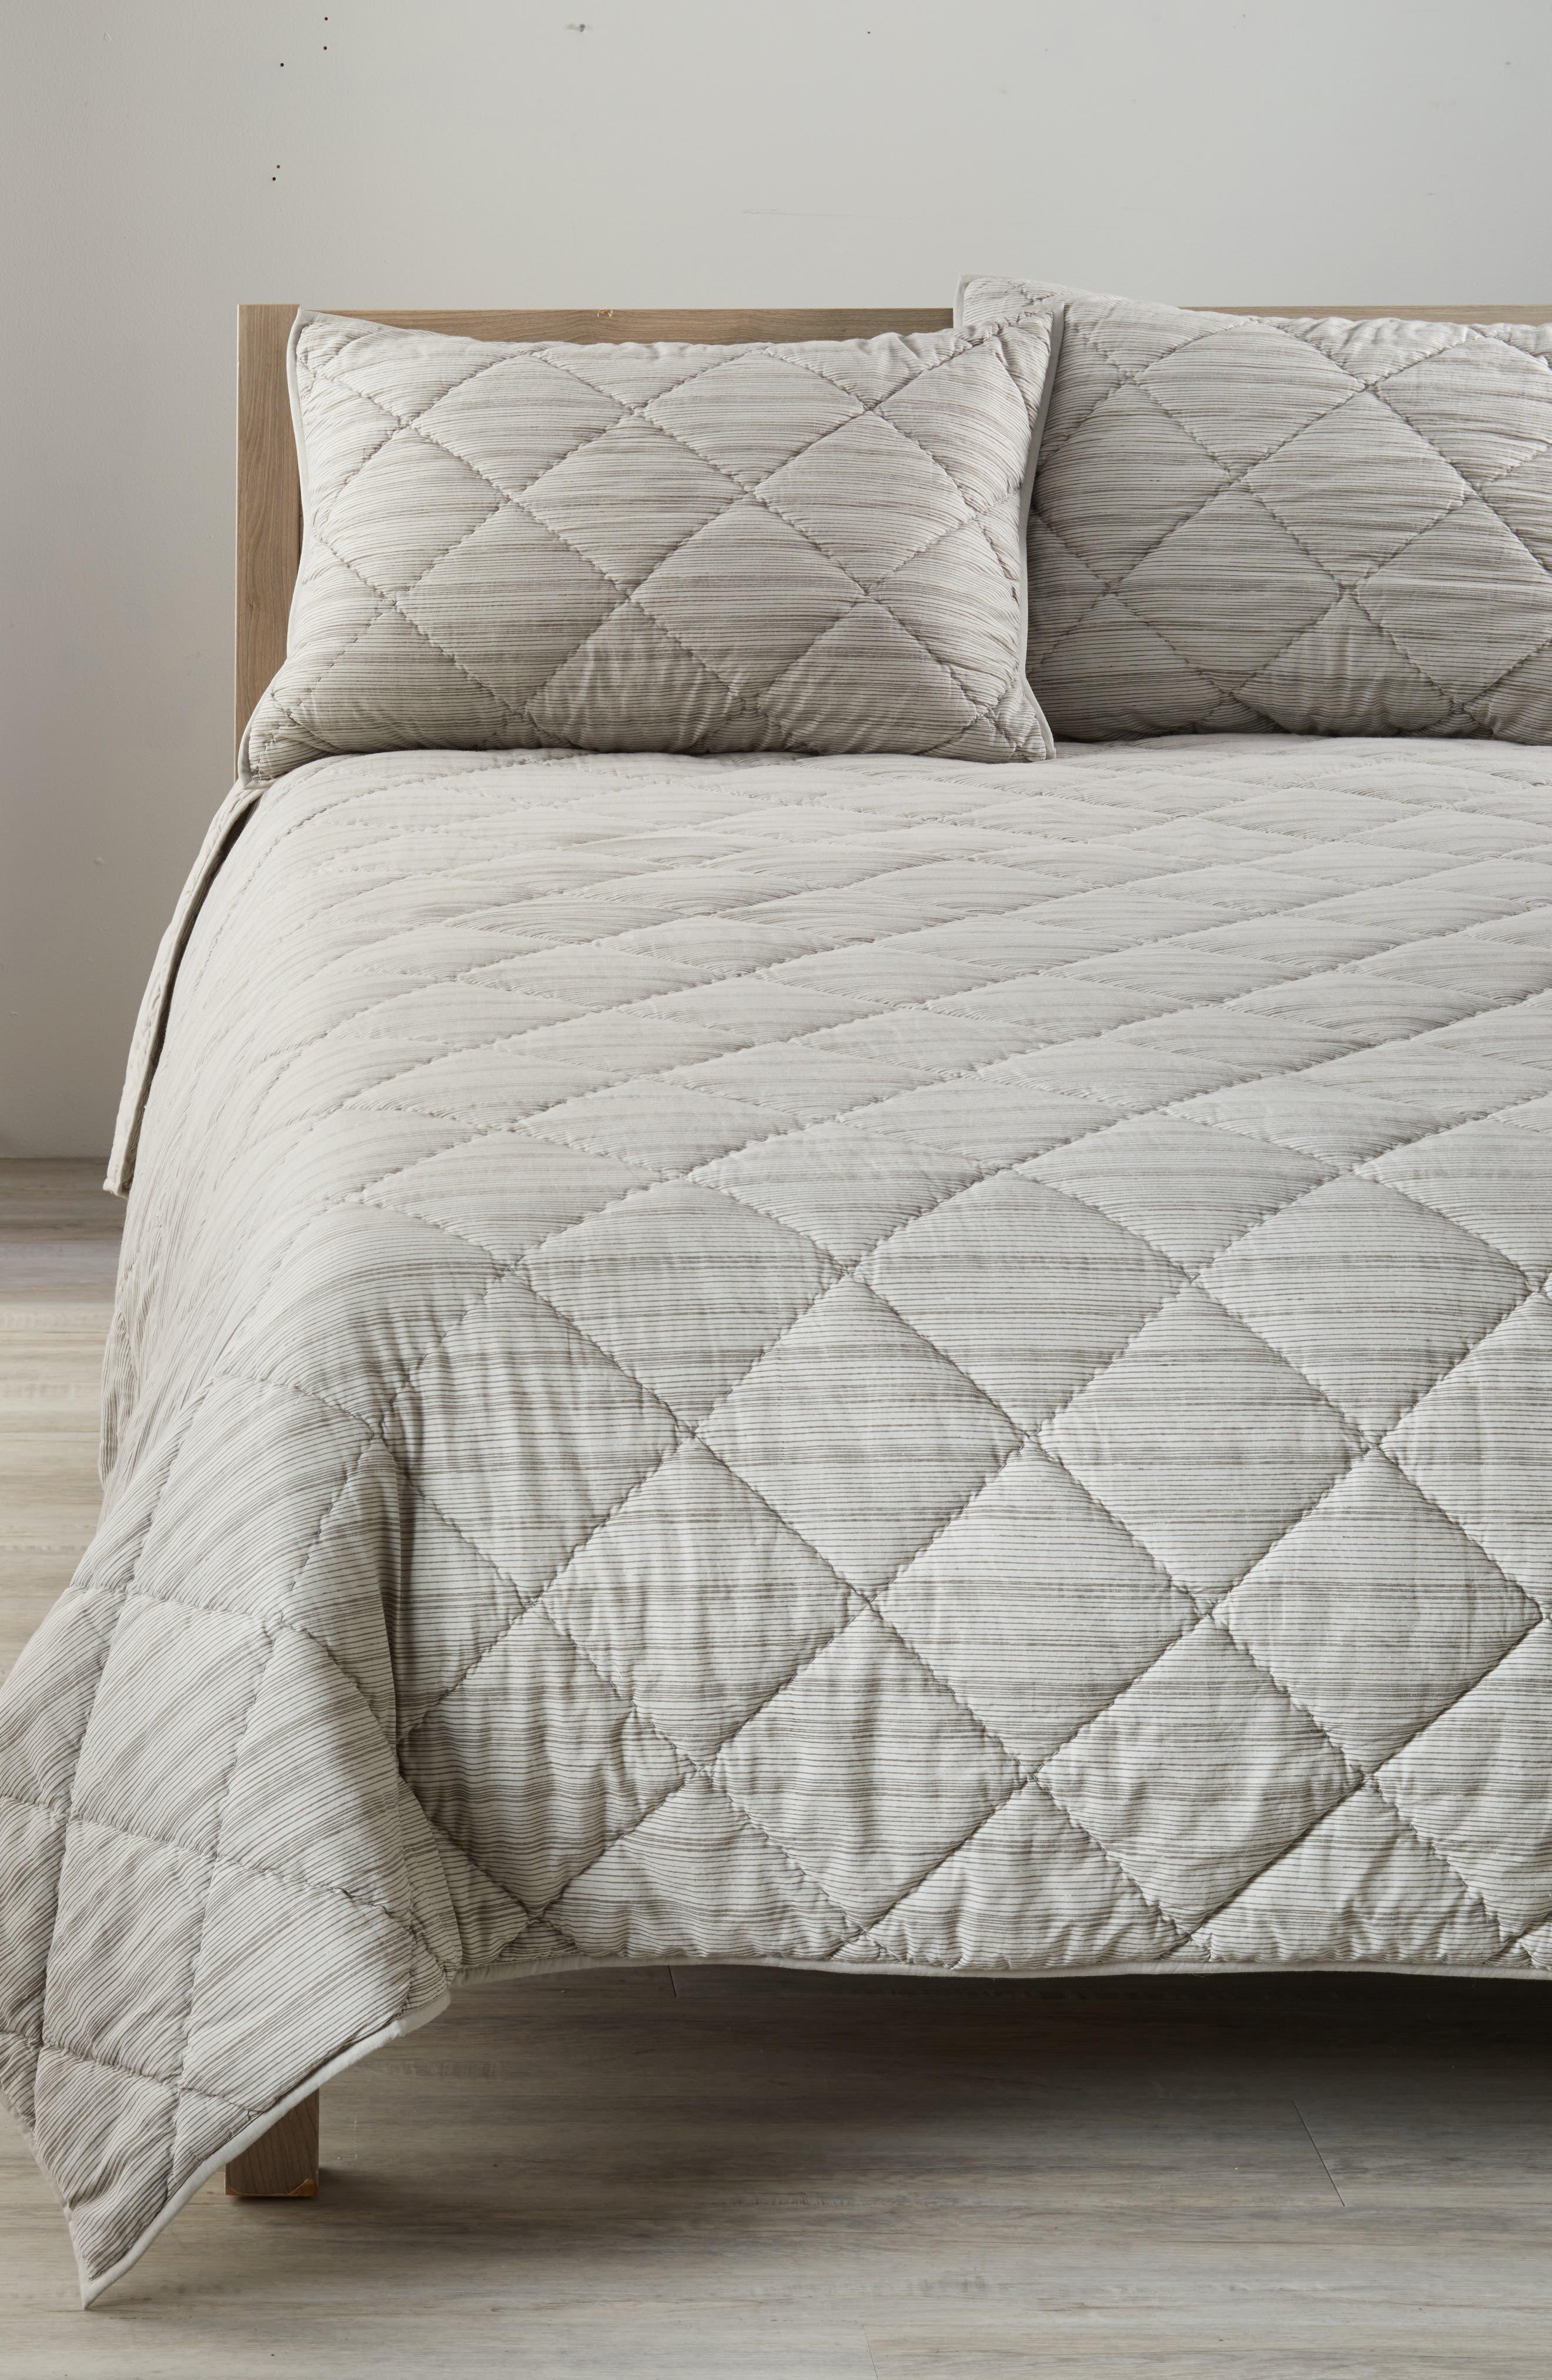 Nordstrom at Home Diamond Stripe Comforter